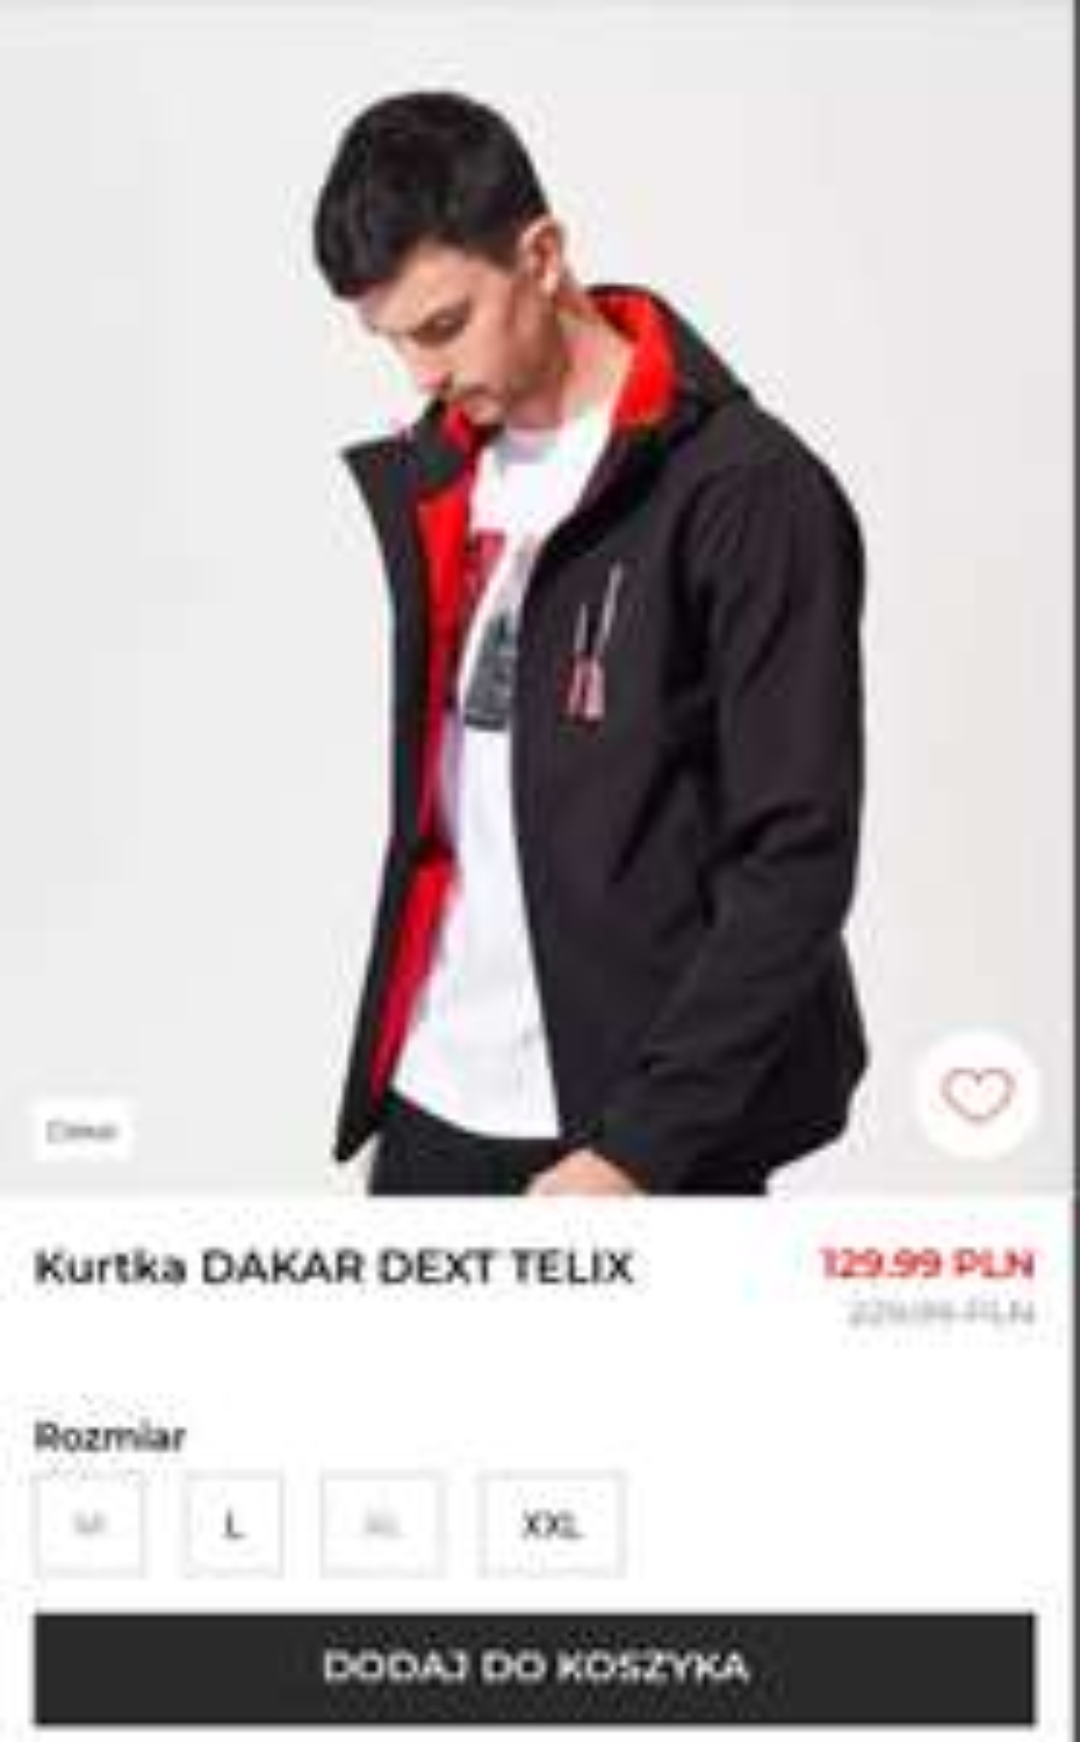 Kurtka DAKAR DEXT TELIX